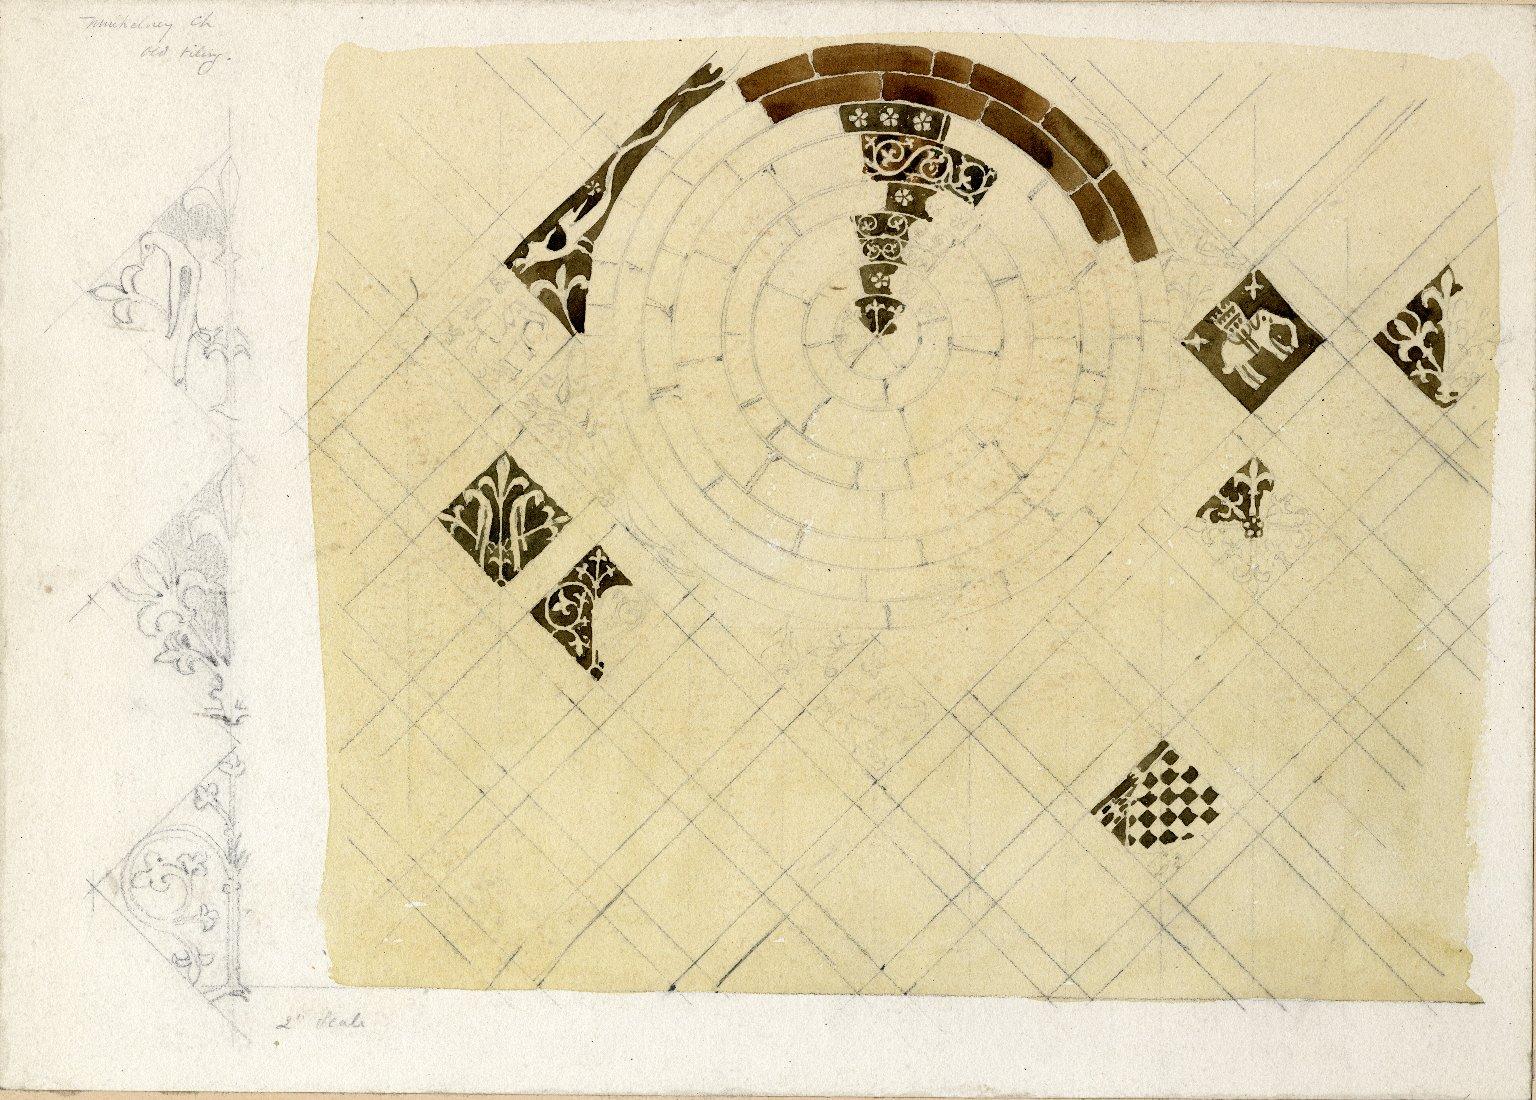 Tile designs from the Muchelney church